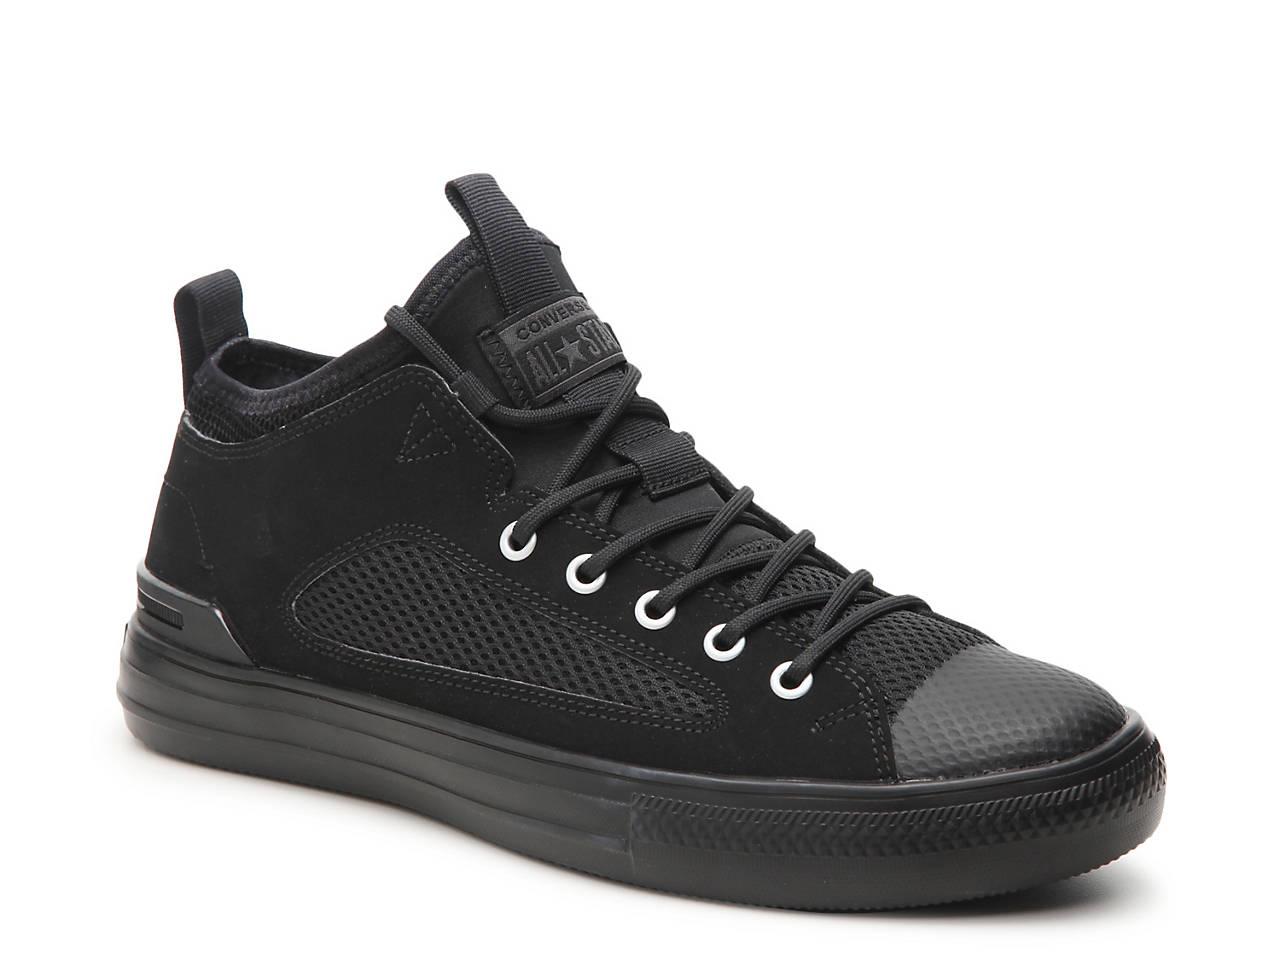 Converse Chuck Taylor All Star Ultra Ox Sneaker Men's